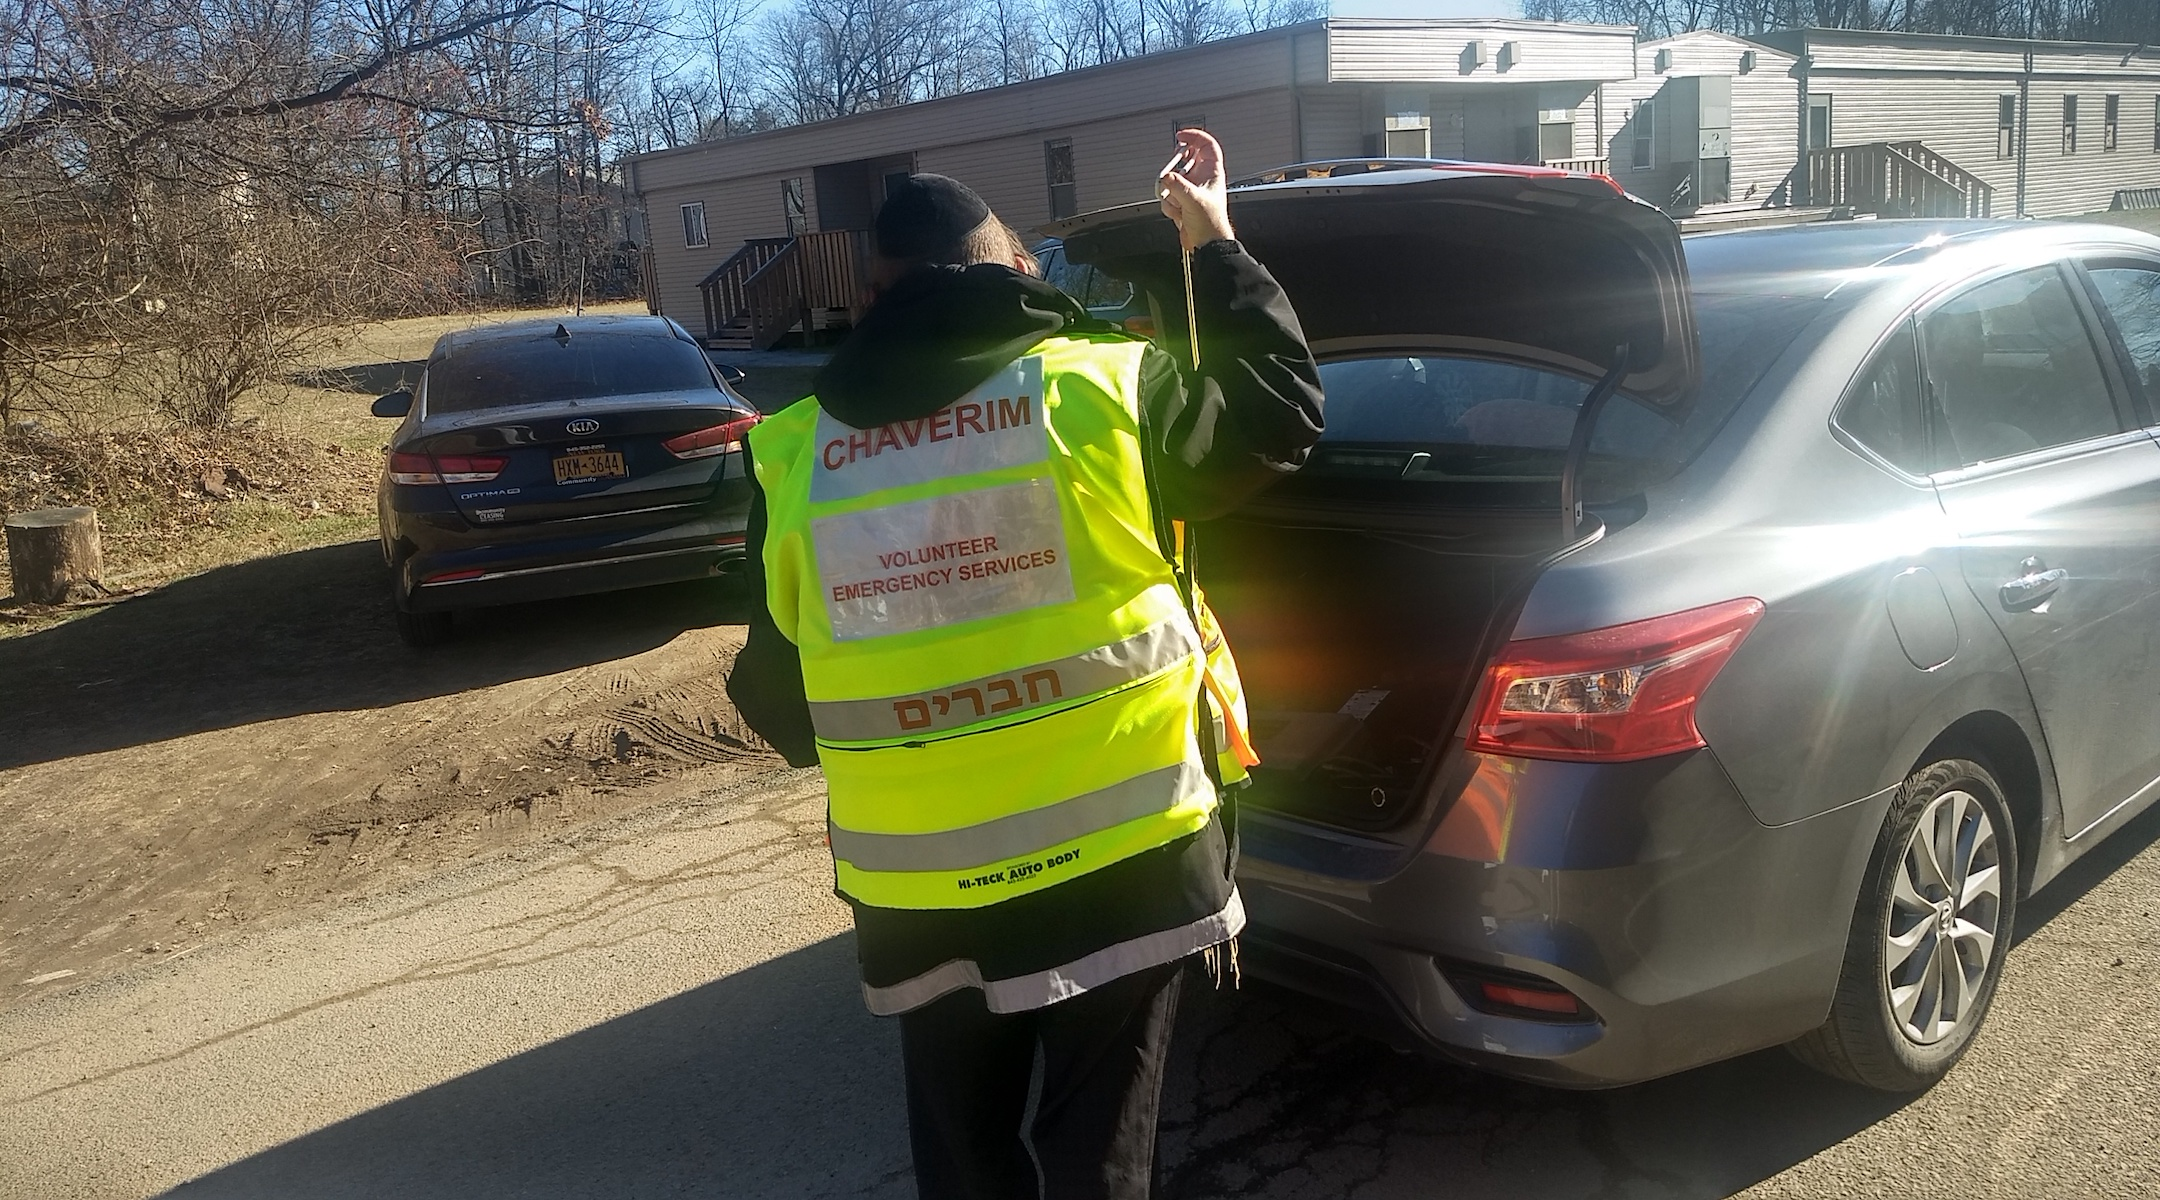 A Chaverim volunteer at work unlocking a car on January 9, 2020. (Ben Sales)